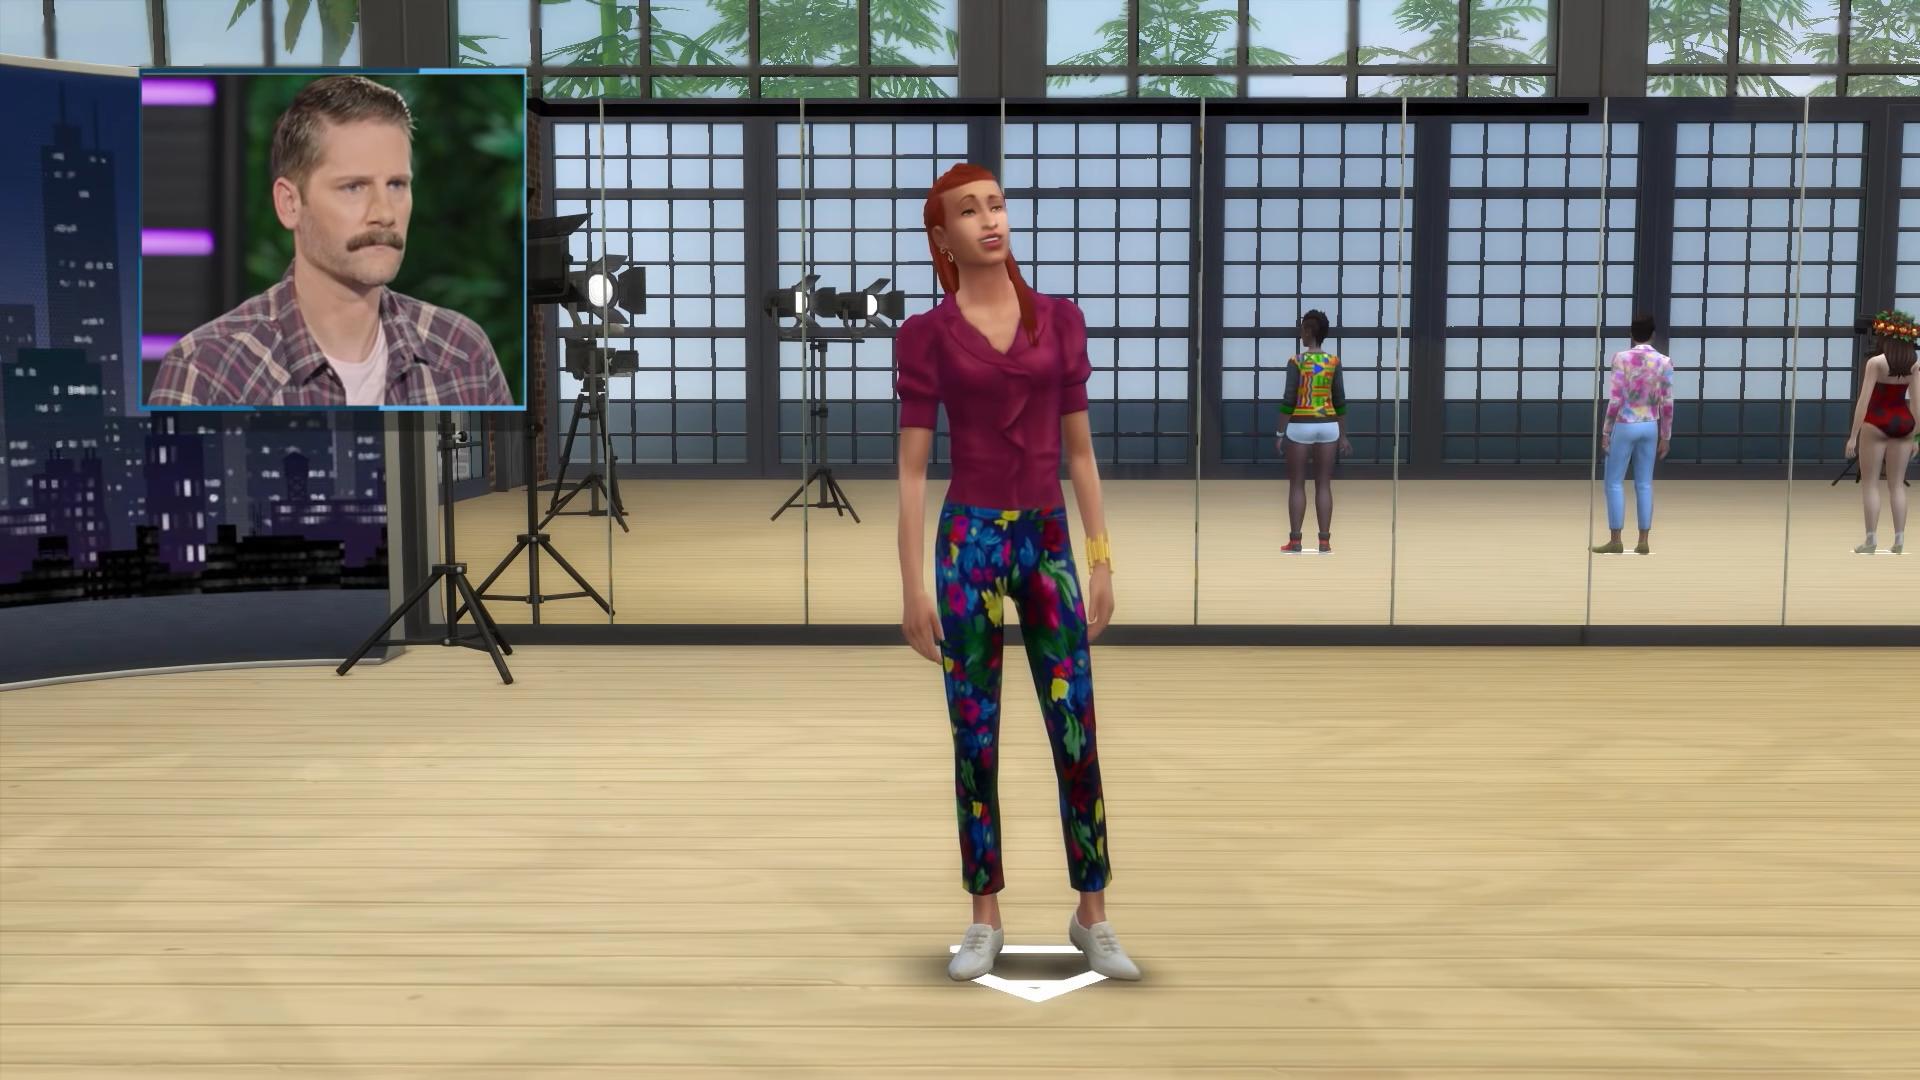 Les Sims Spark'd Screenshot-2020-08-03-174319